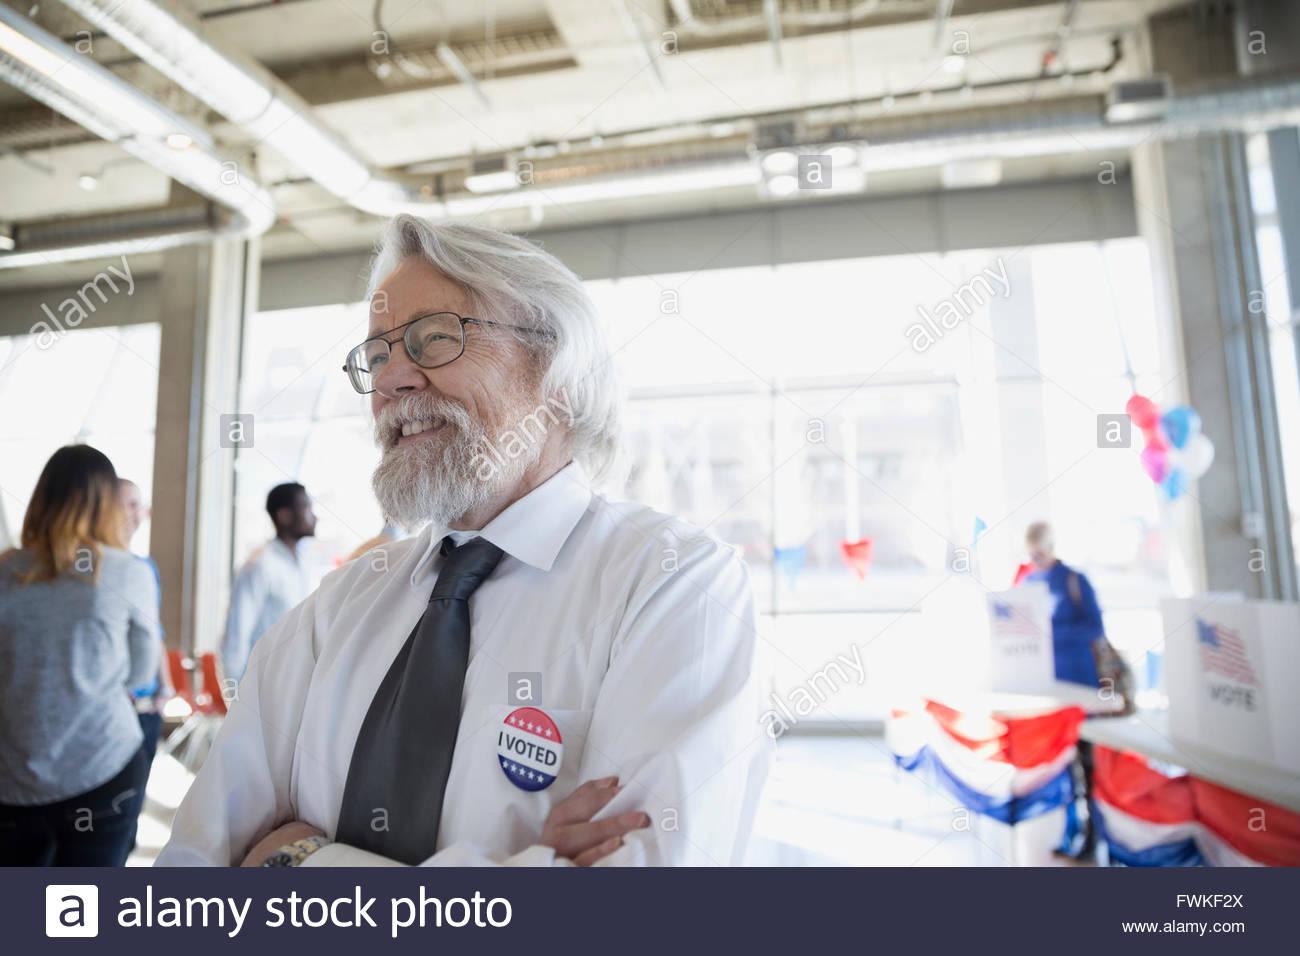 Smiling senior man at voter polling place - Stock Image